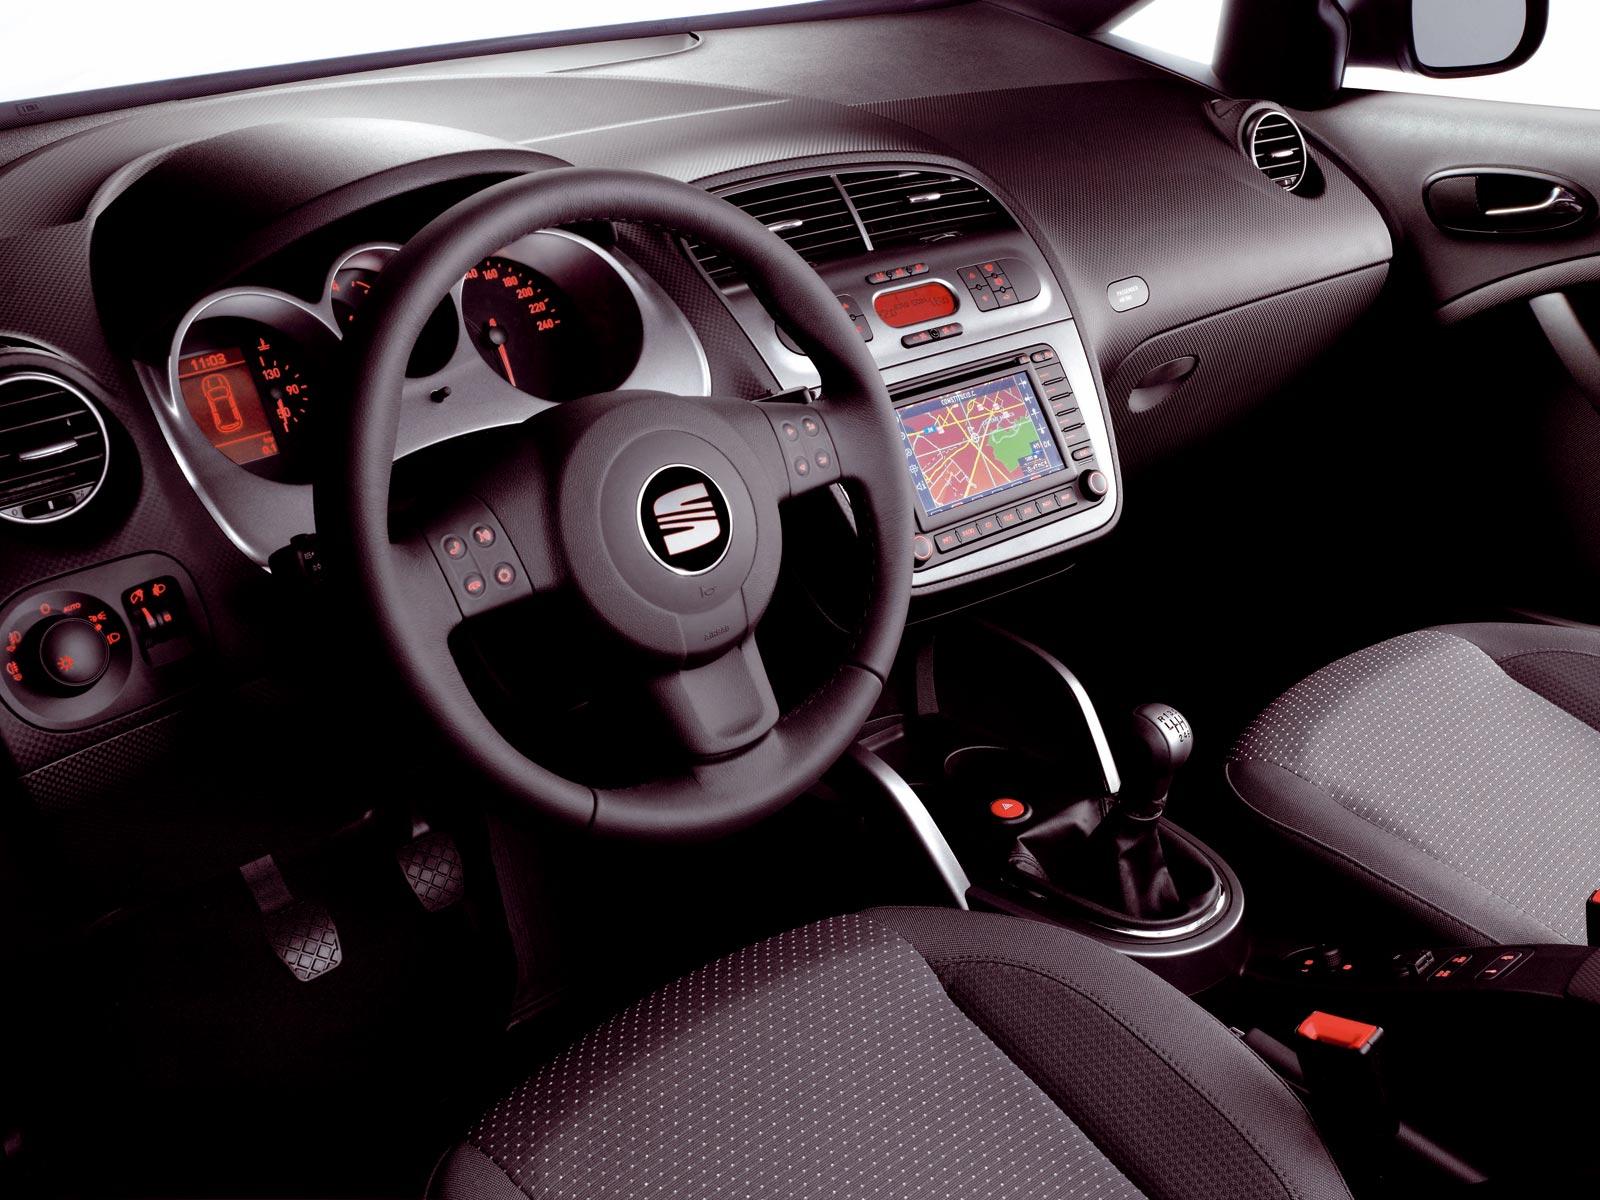 2006 Seat Altea XL (c) Seat